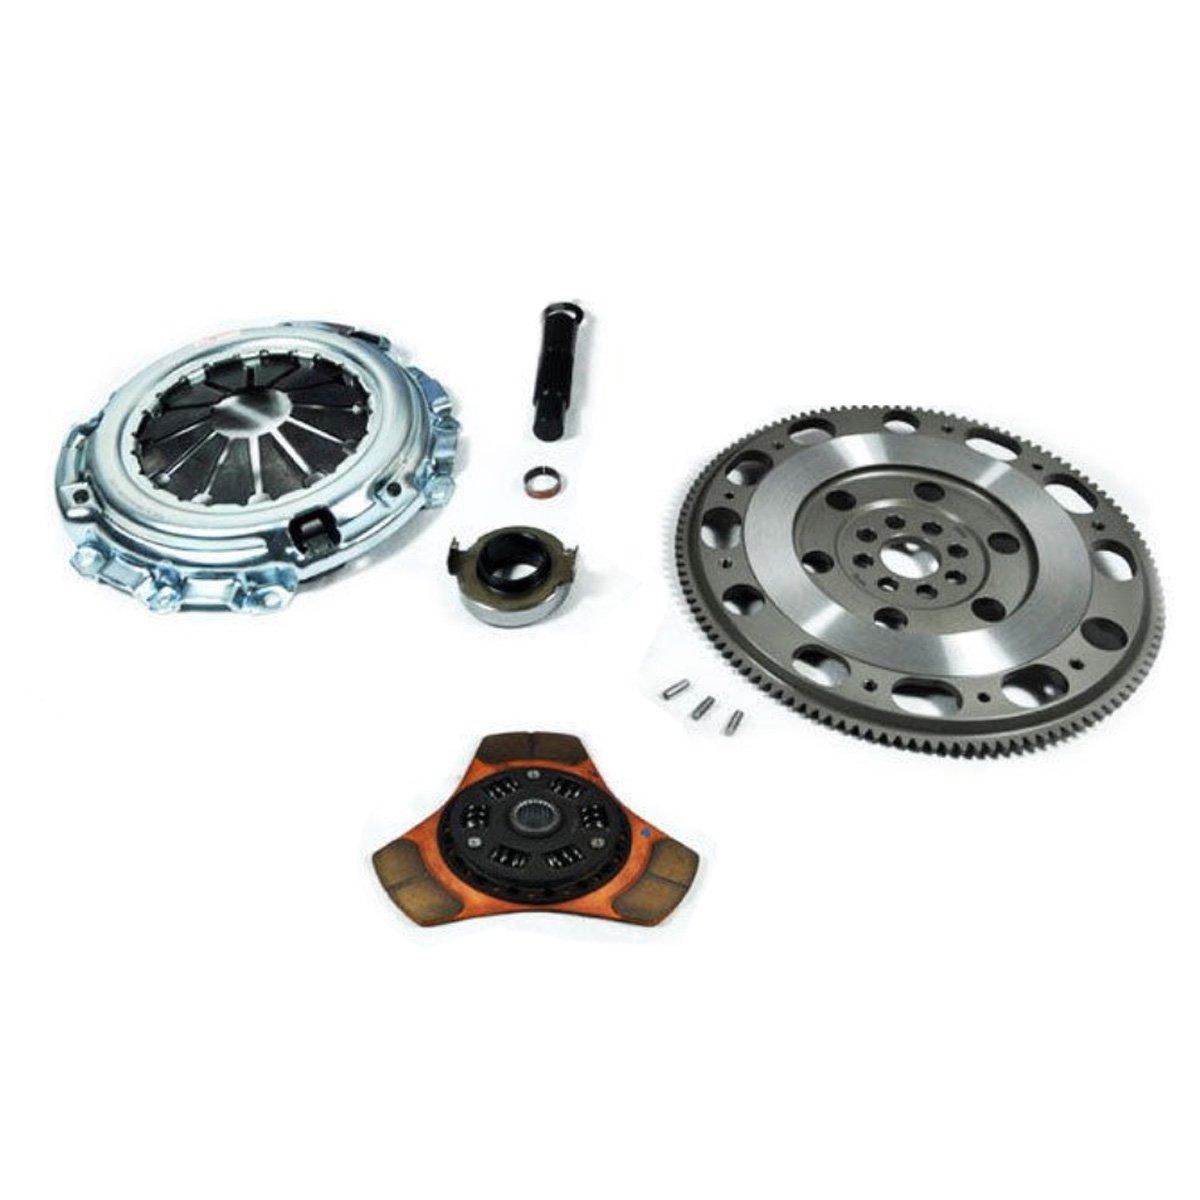 Amazon.com: EXEDY STAGE 2 CLUTCH KIT+HF02 RACING FLYWHEEL RSX CIVIC Si 2.0L TSX ACCORD 2.4L: Automotive